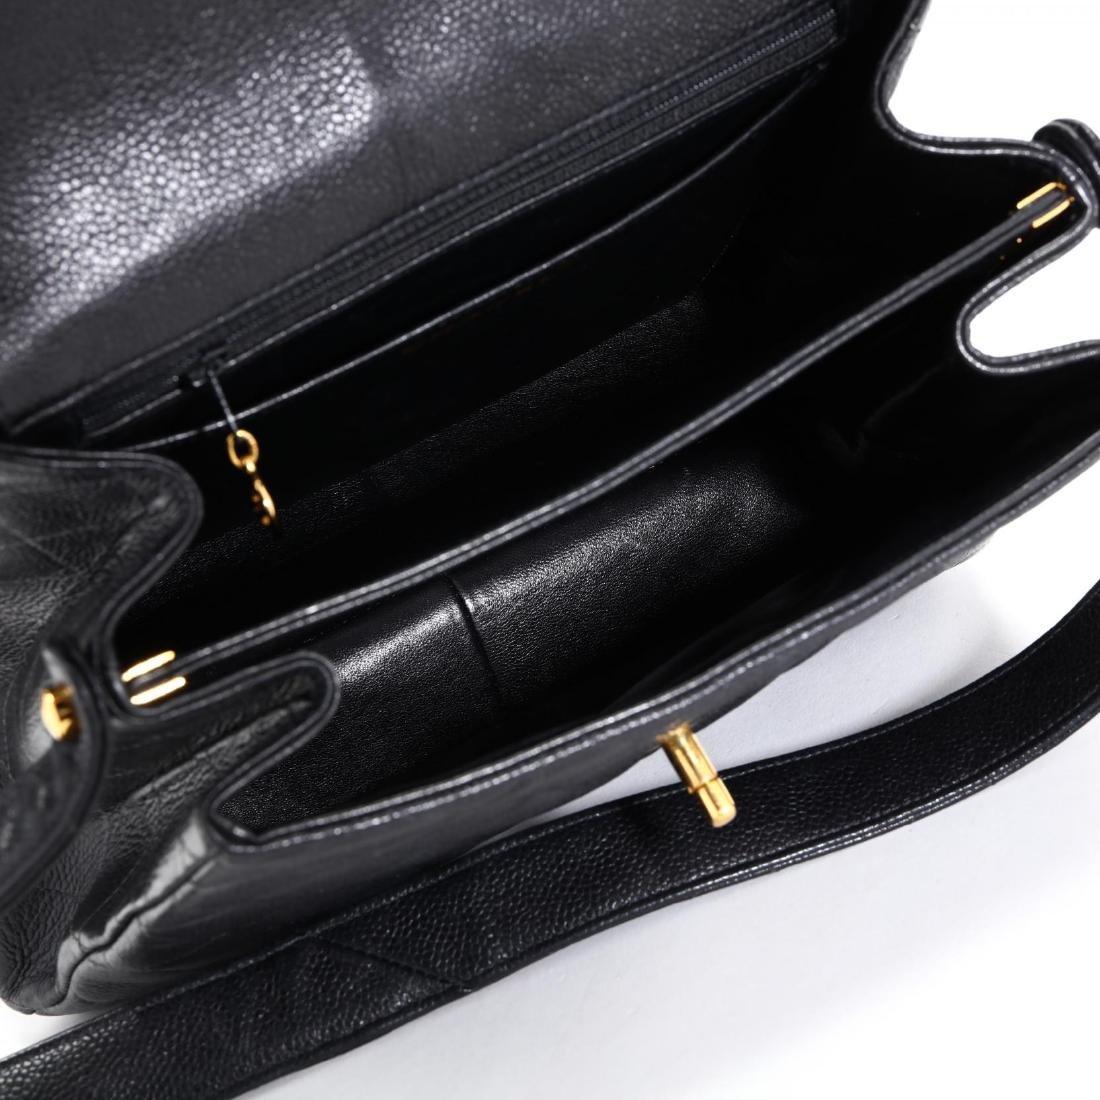 Caviar Leather Trapeze Flap Handbag, Chanel - 10